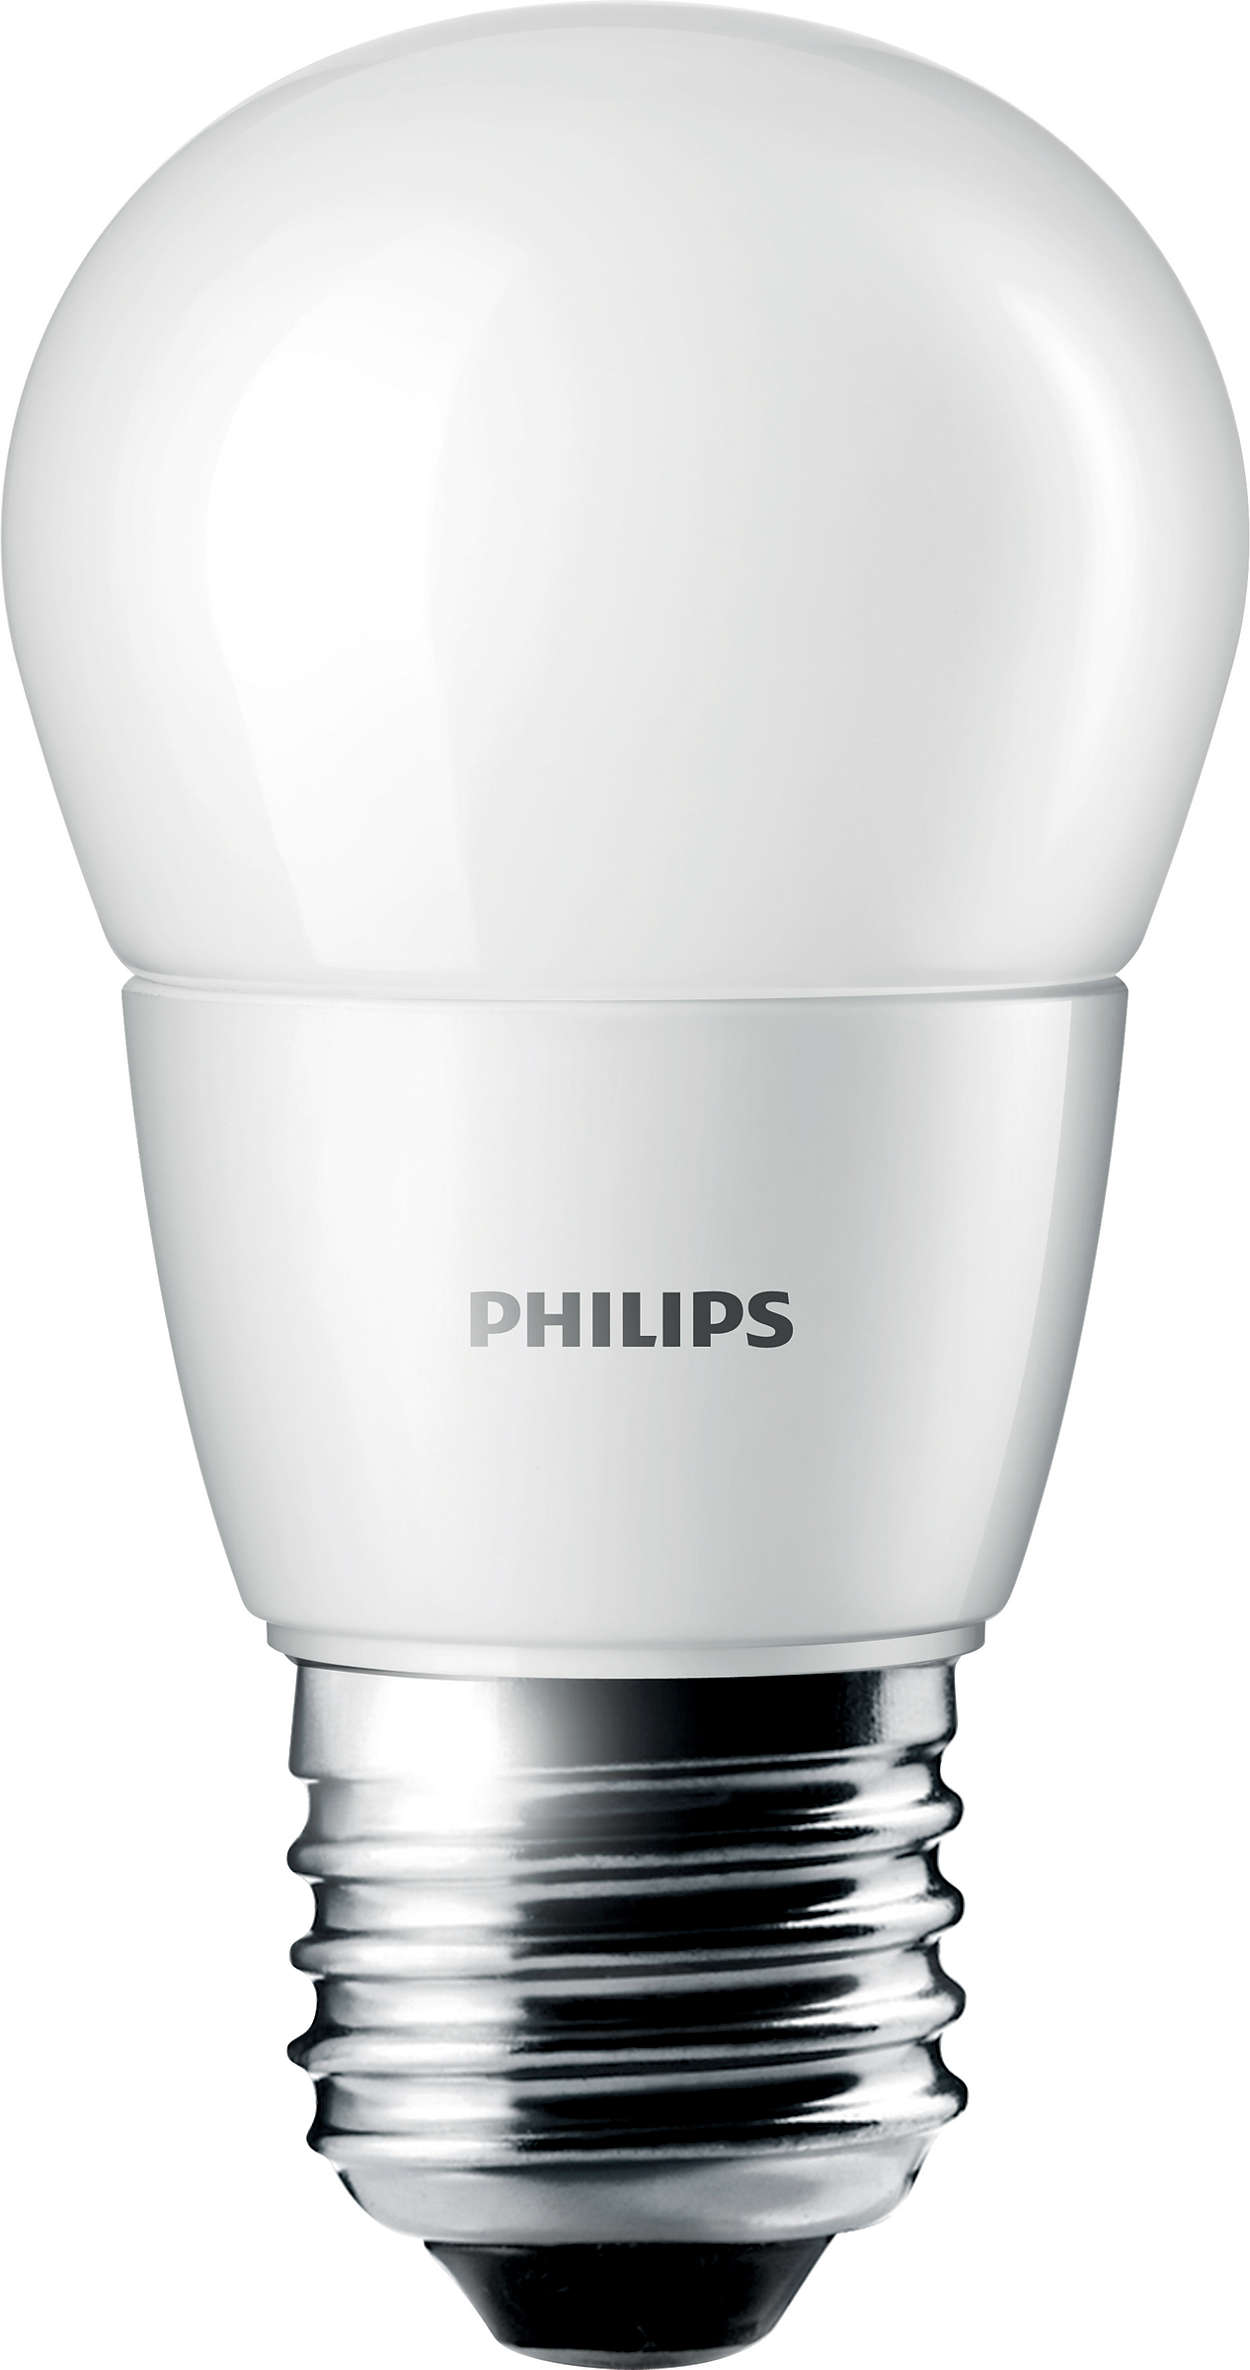 Доступное решение на основе светодиодов LEDluster